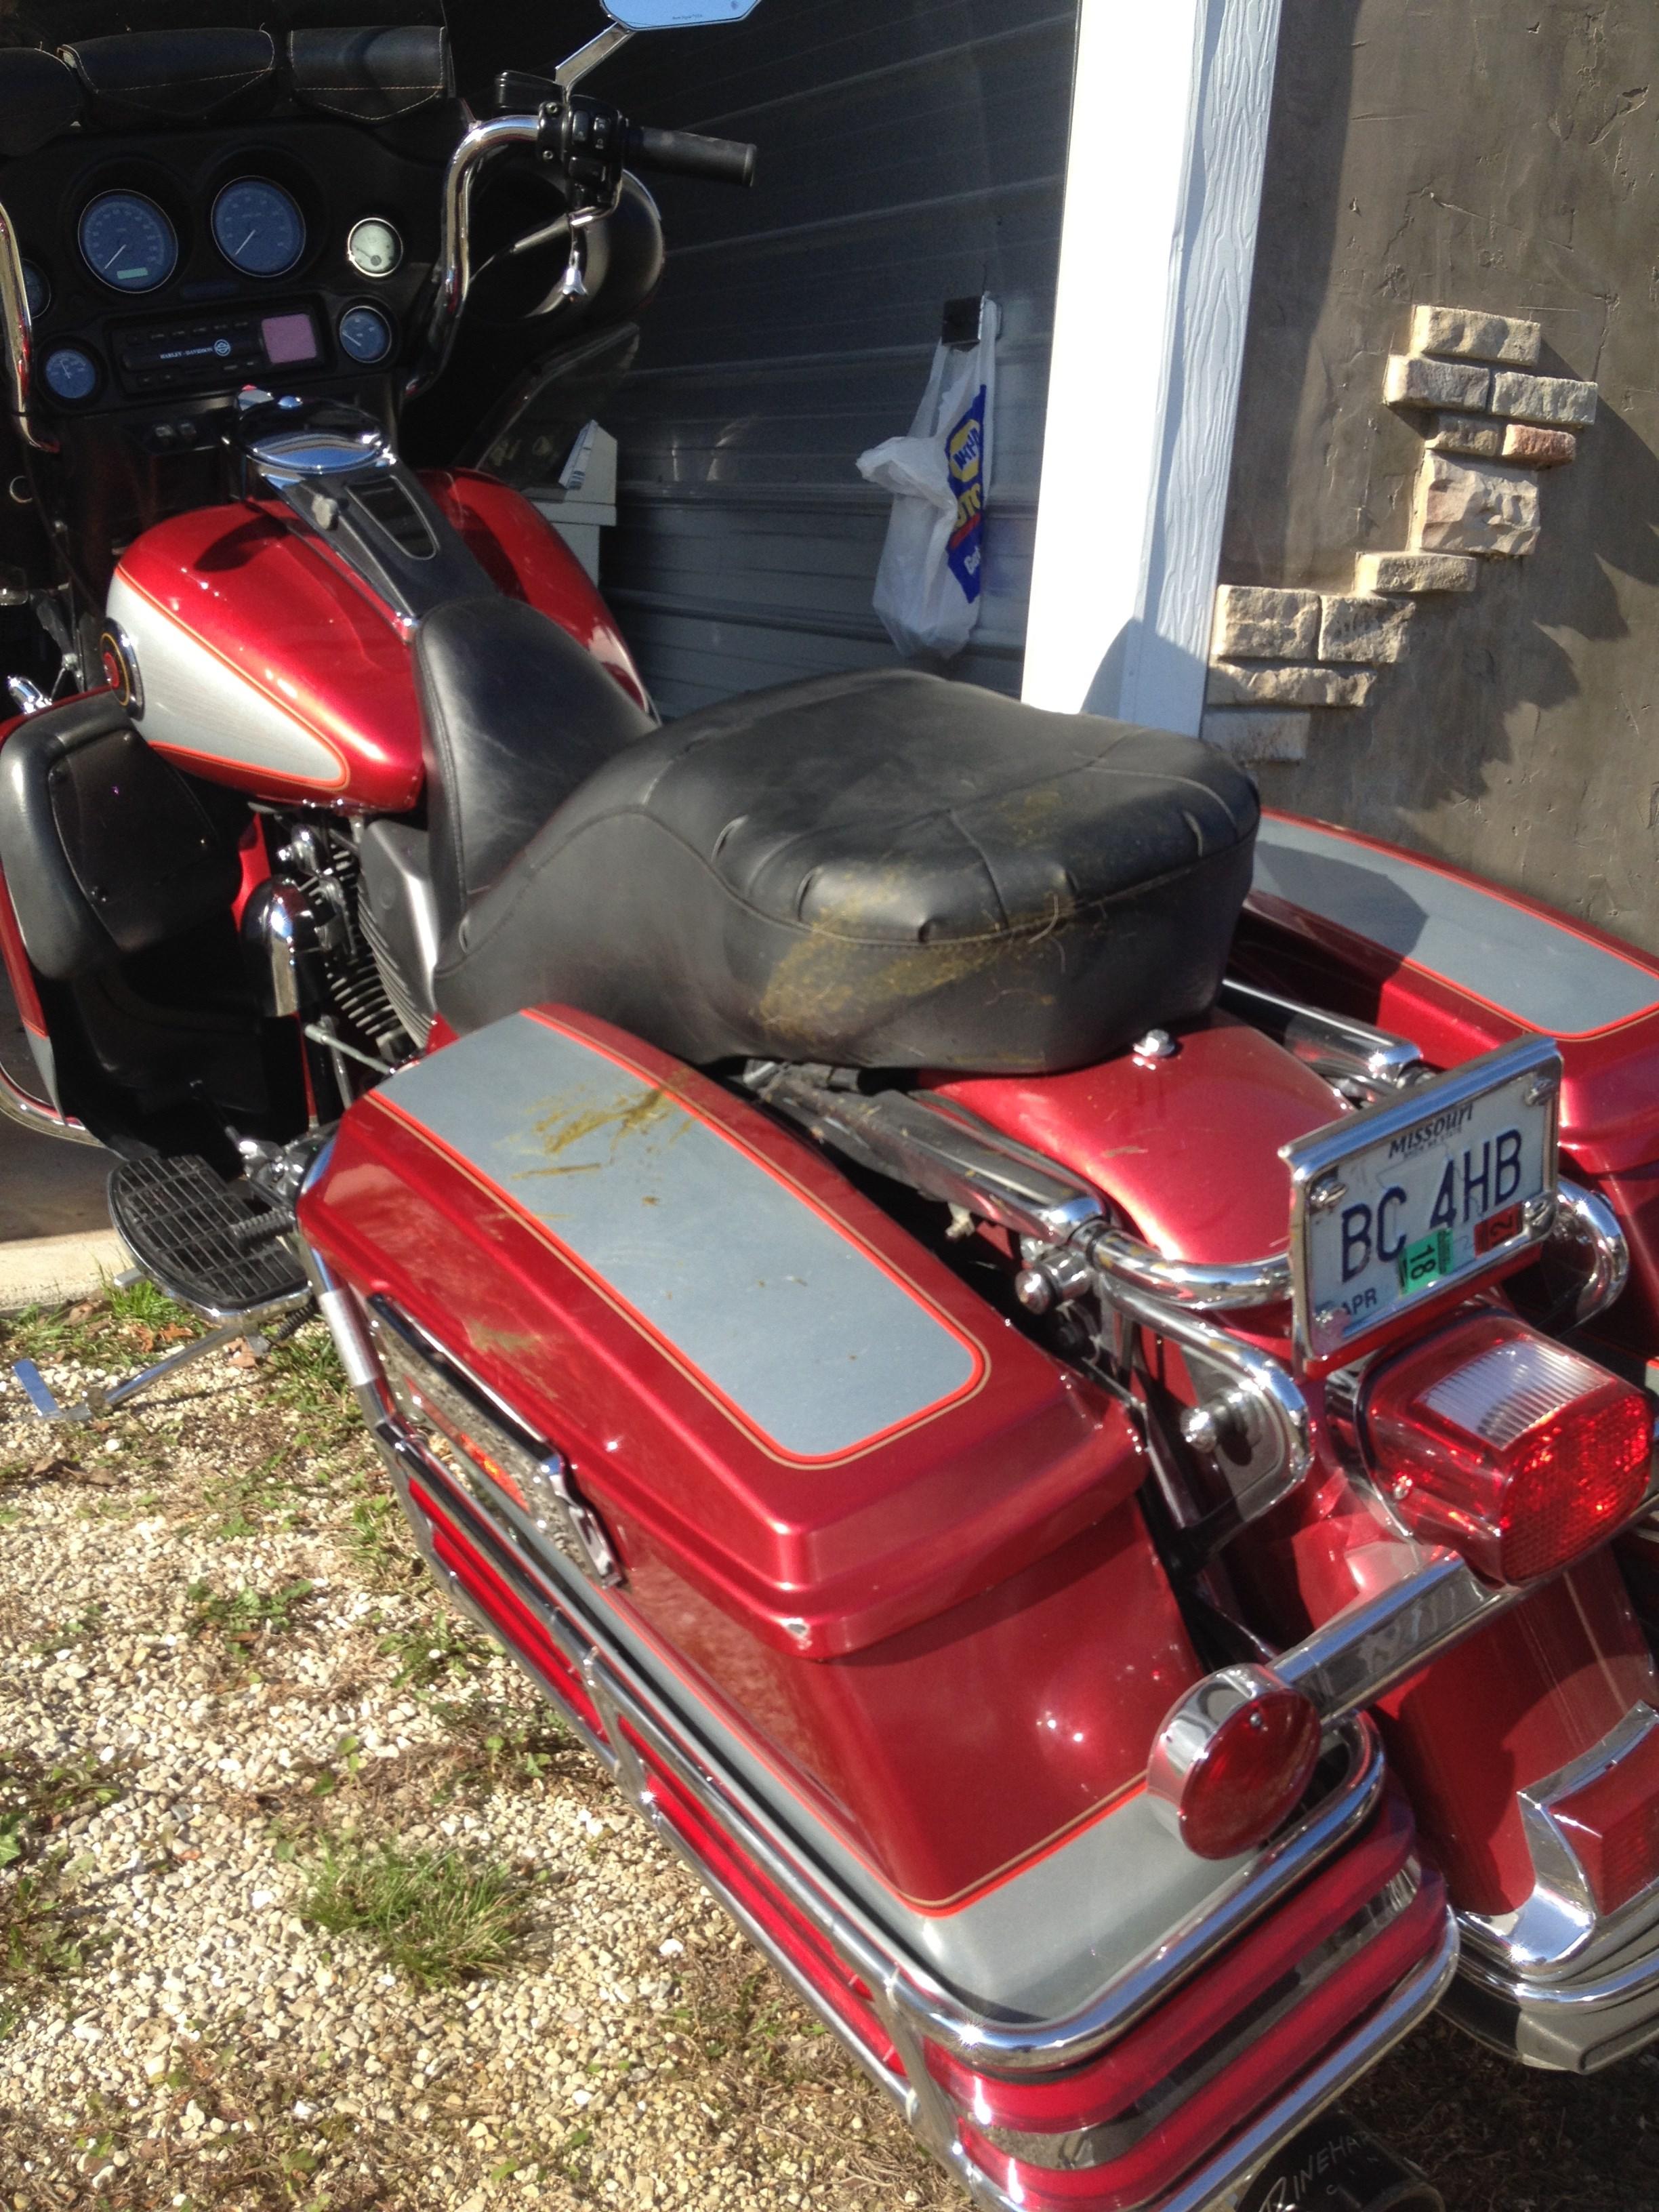 Harley Davidson Red Deer >> 2004 Harley-Davidson® FLHTCU/I Ultra Classic® Electra Glide® (Candy Red & Silver), Pittsburg ...